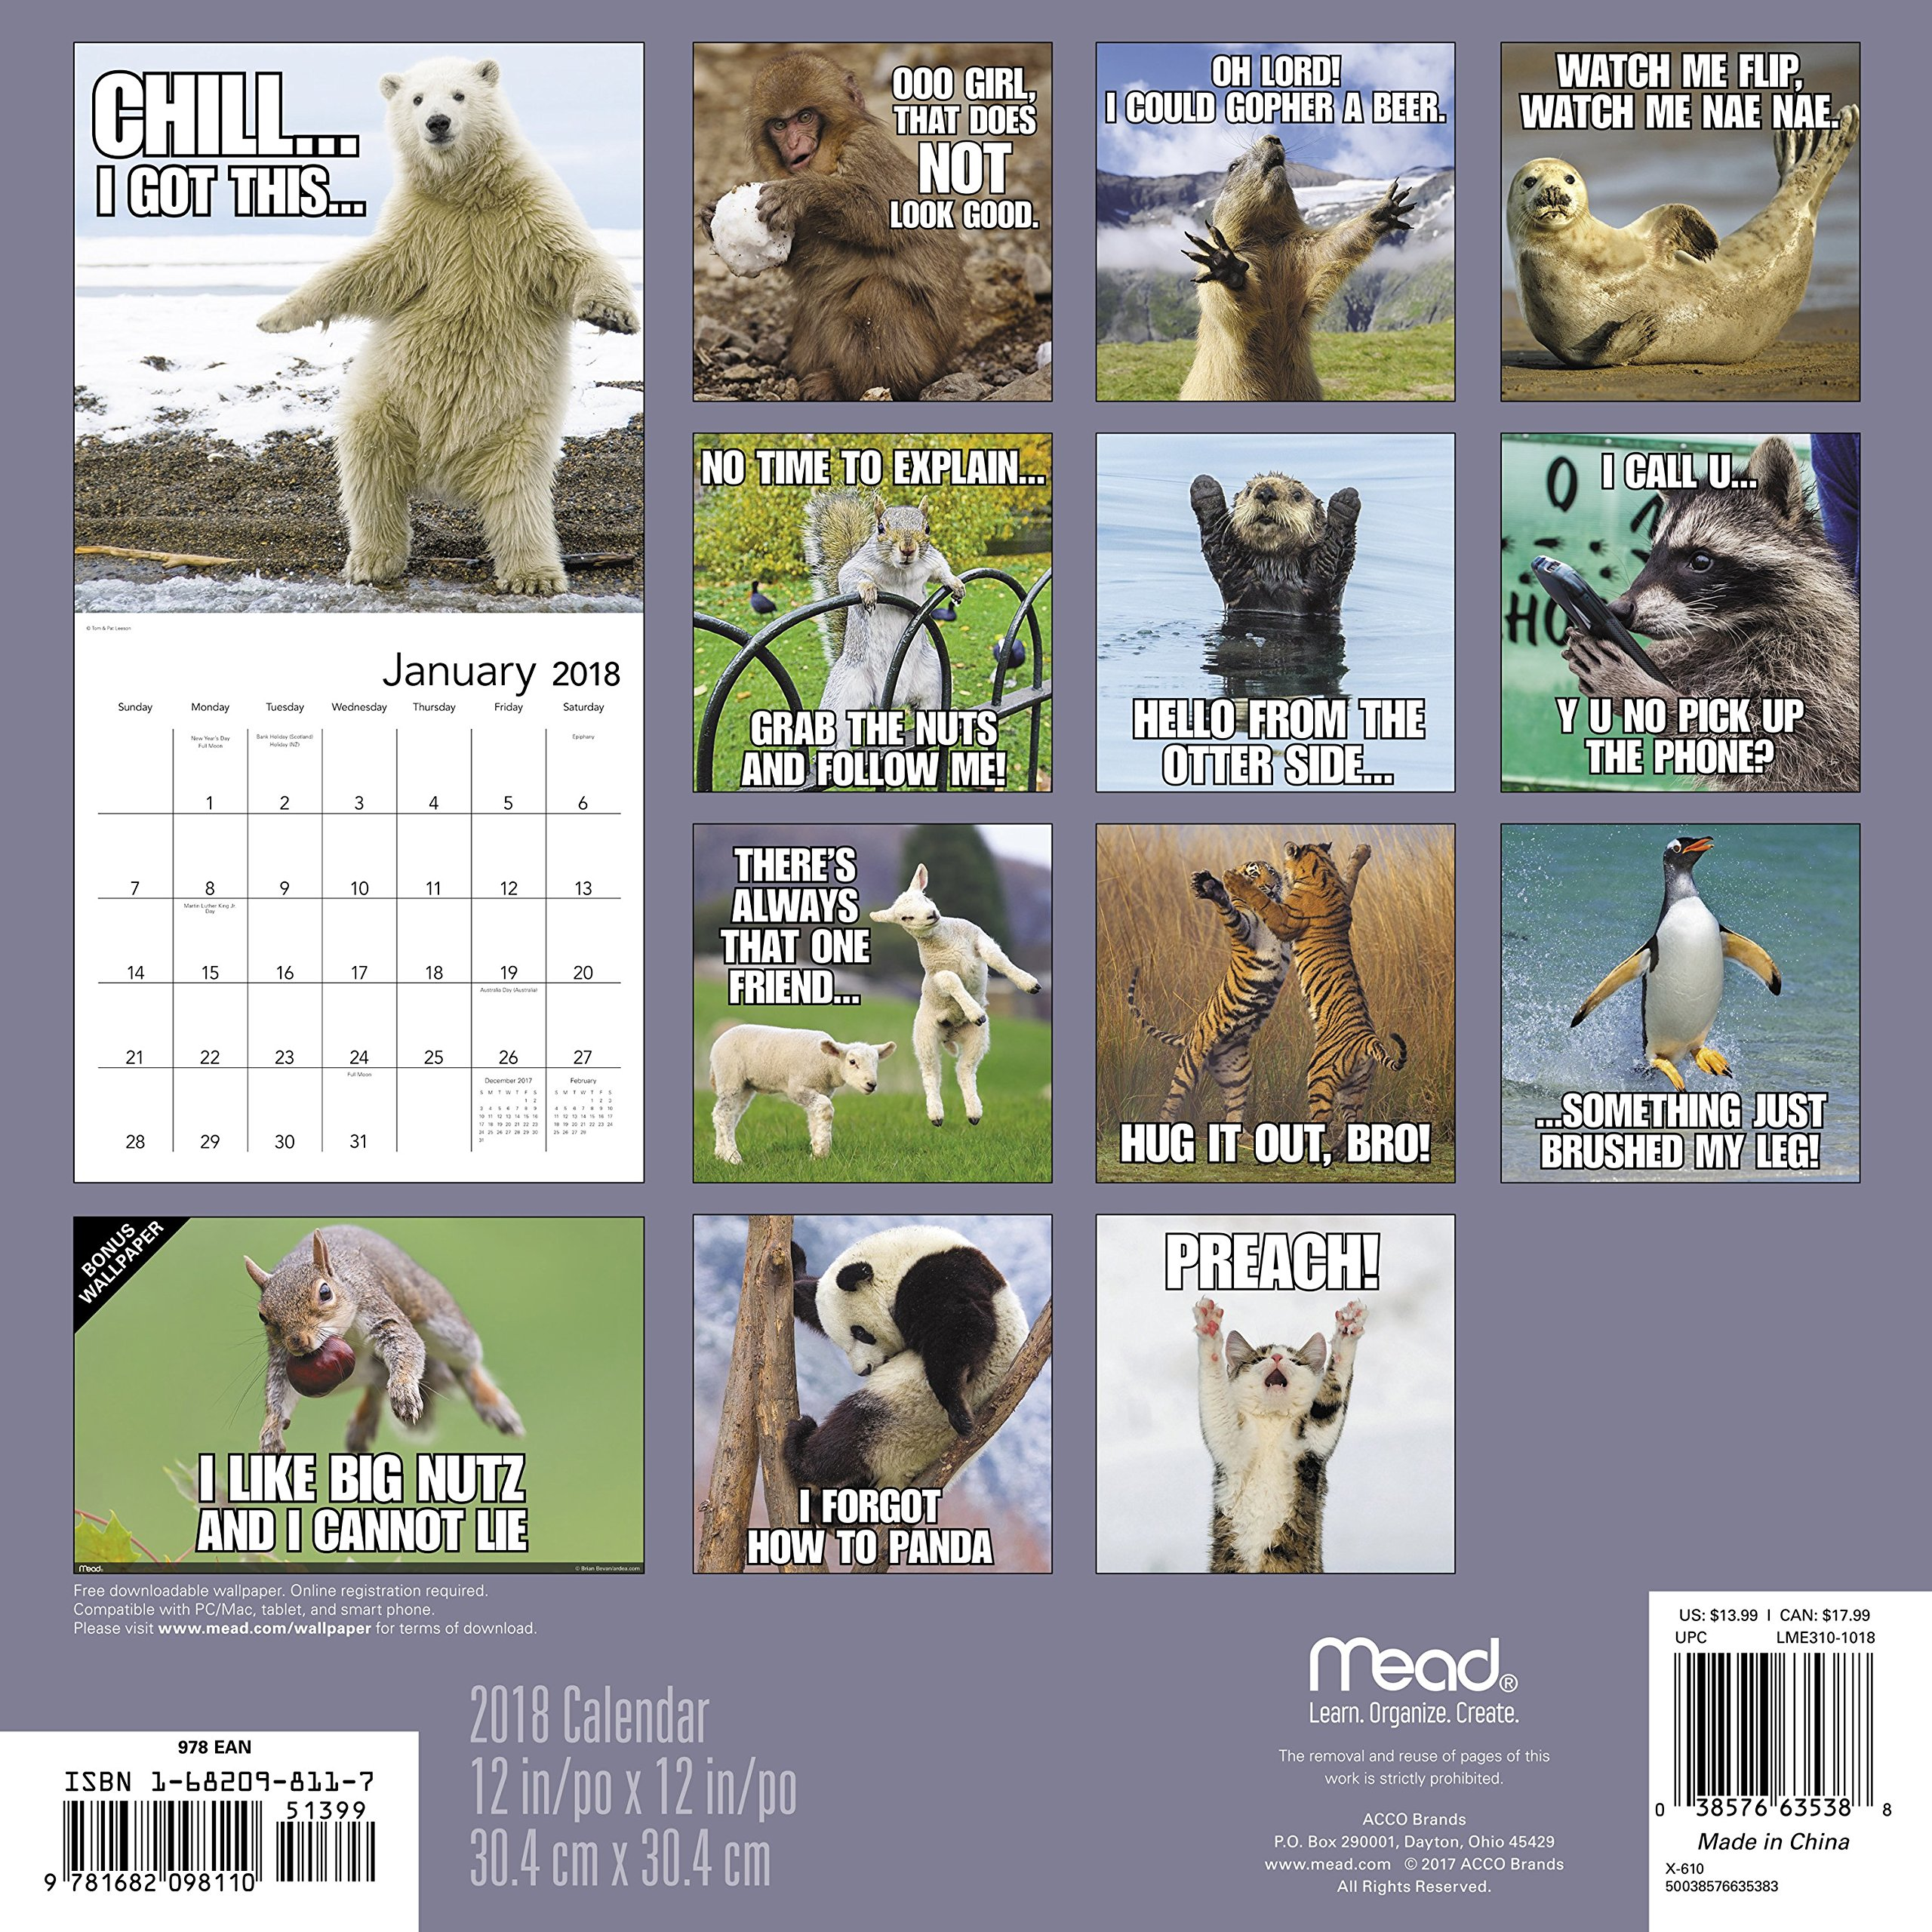 A1Otd %2BwkUL 2018 animal memes wall calendar (mead) mead 9781682098110